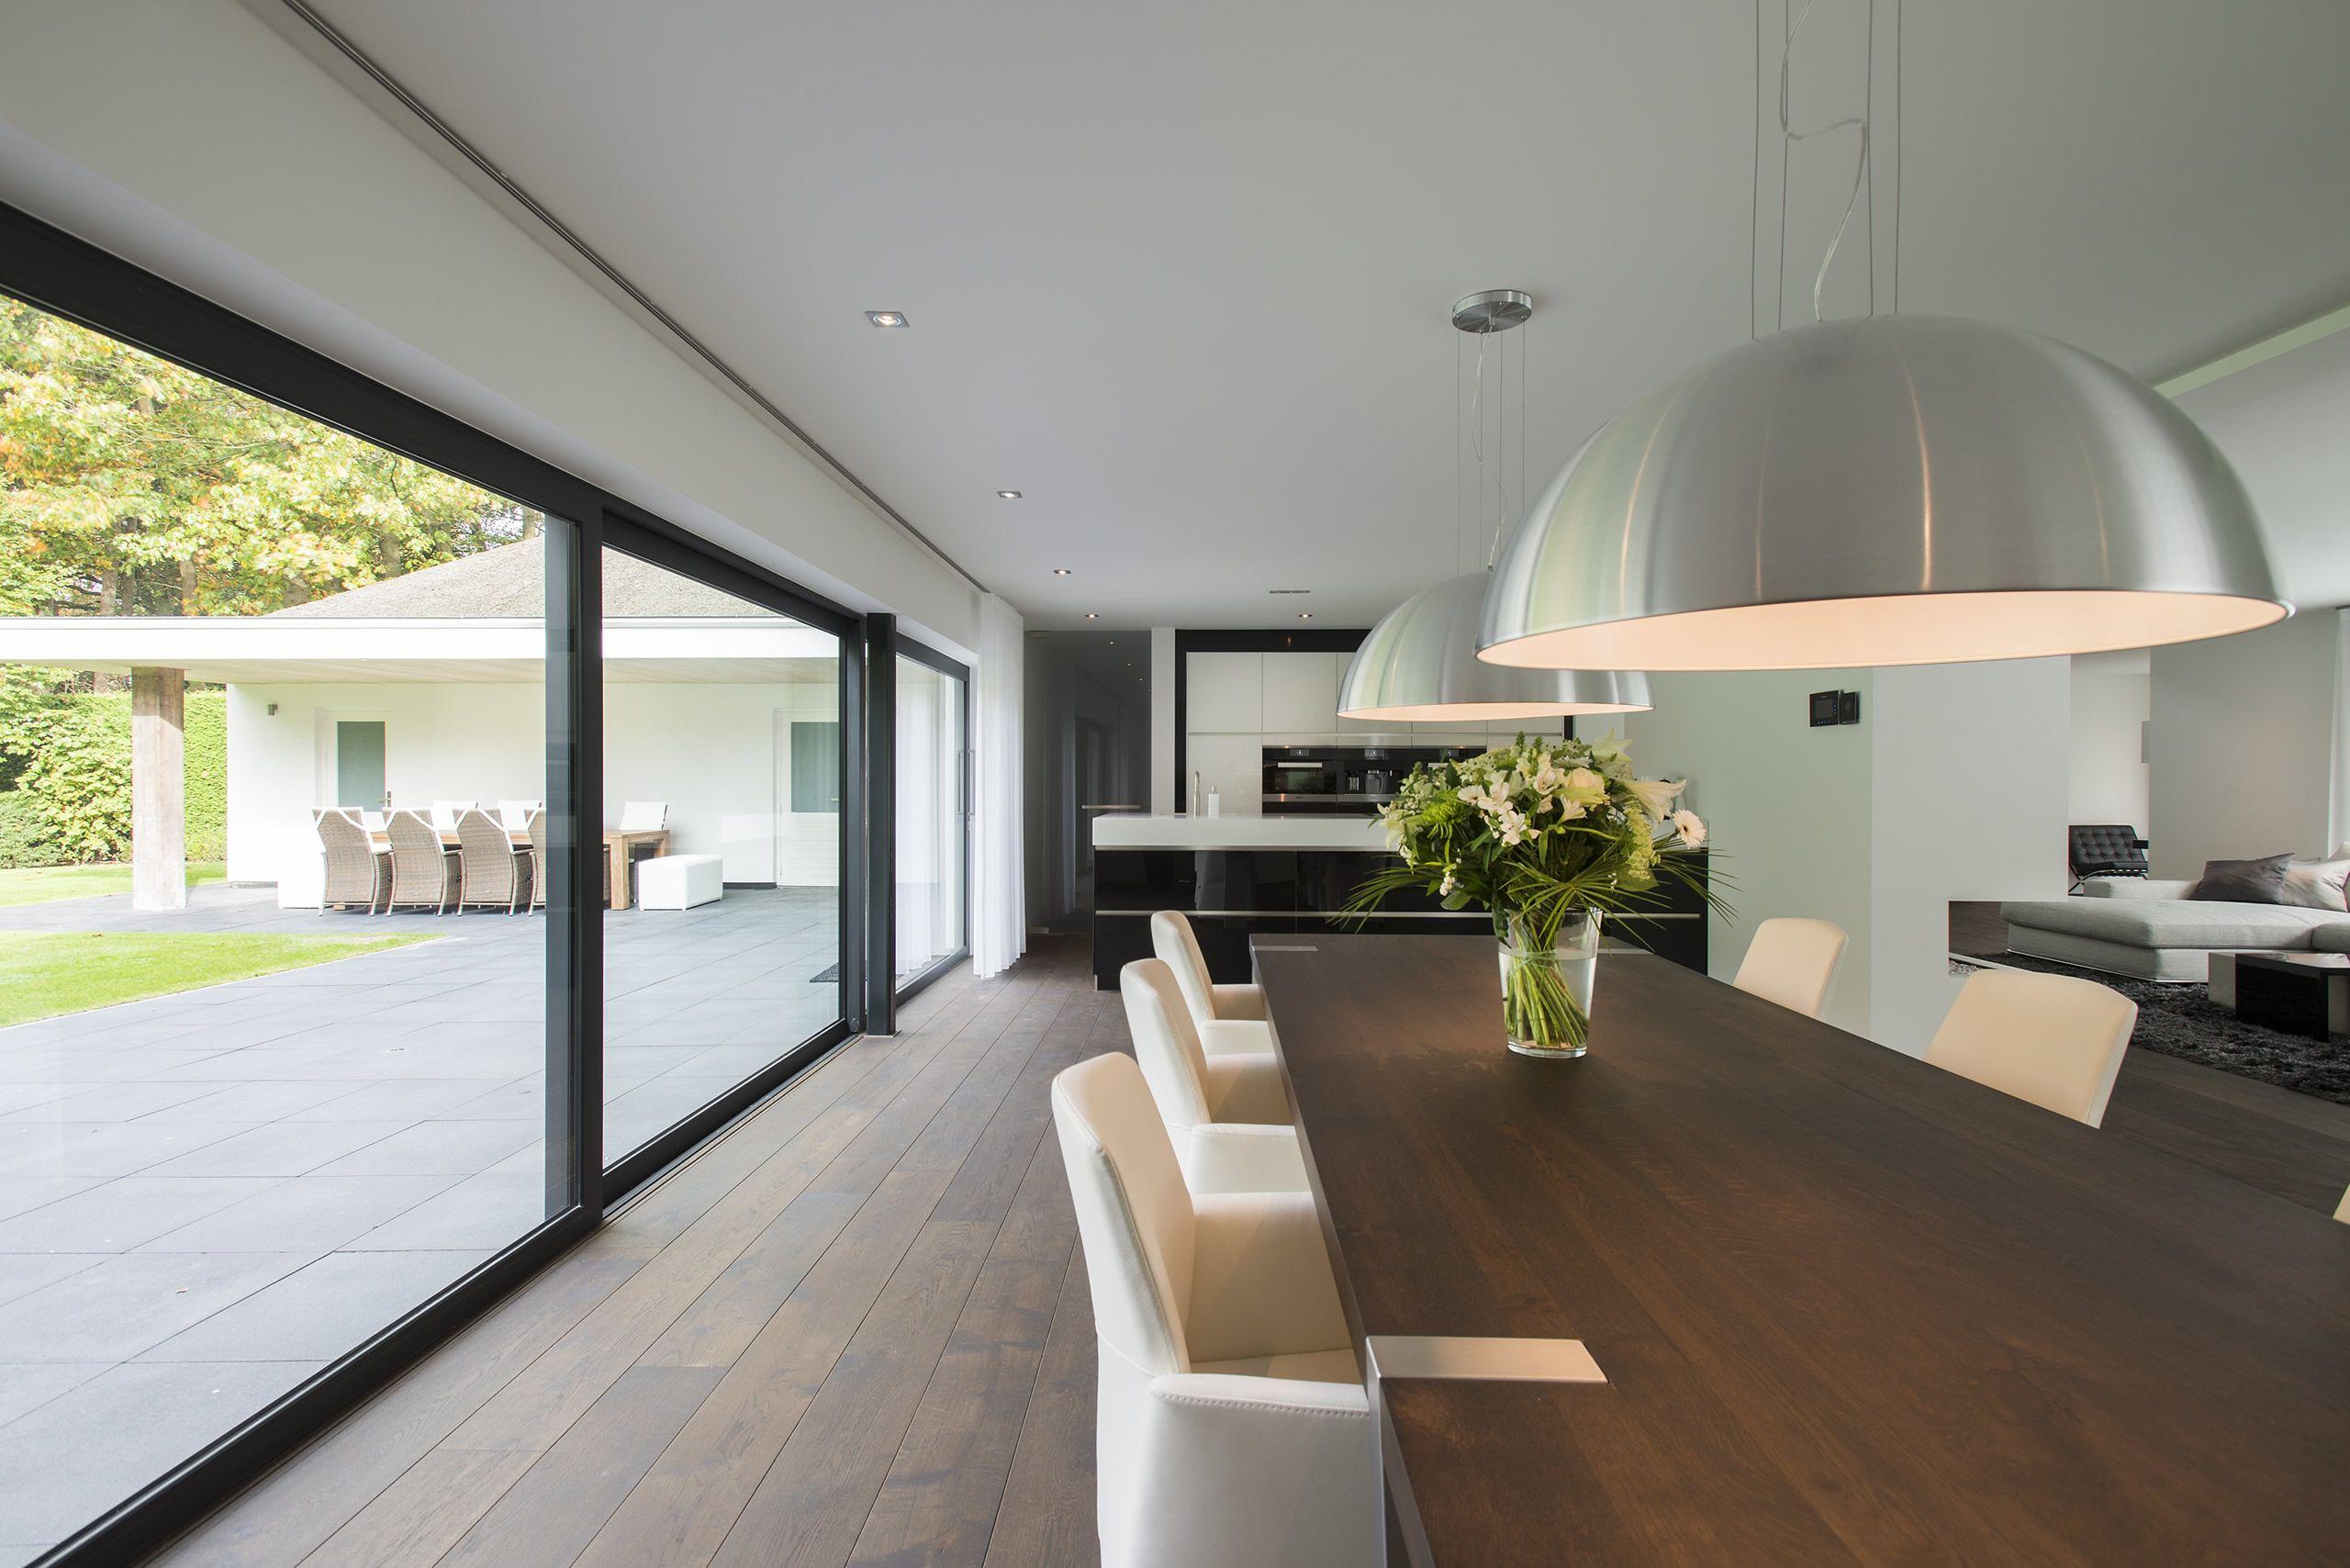 Eetkamer. interieur modern huis: lab architecten moderne eigentijdse